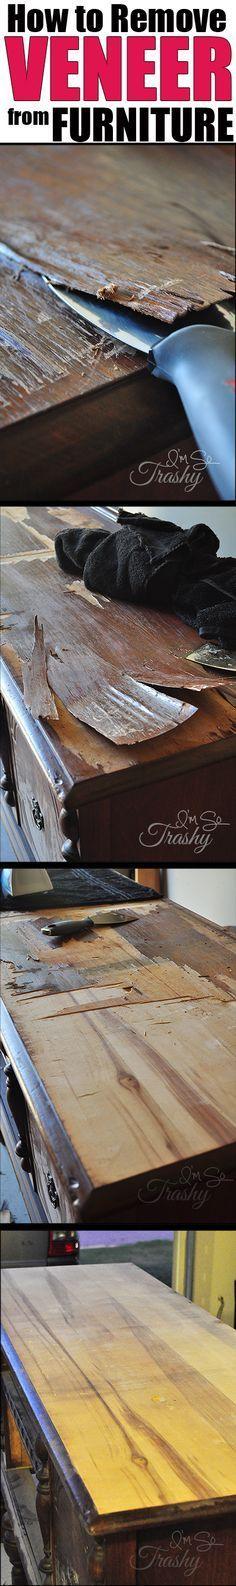 25 Best Ideas About Painting Veneer Furniture On